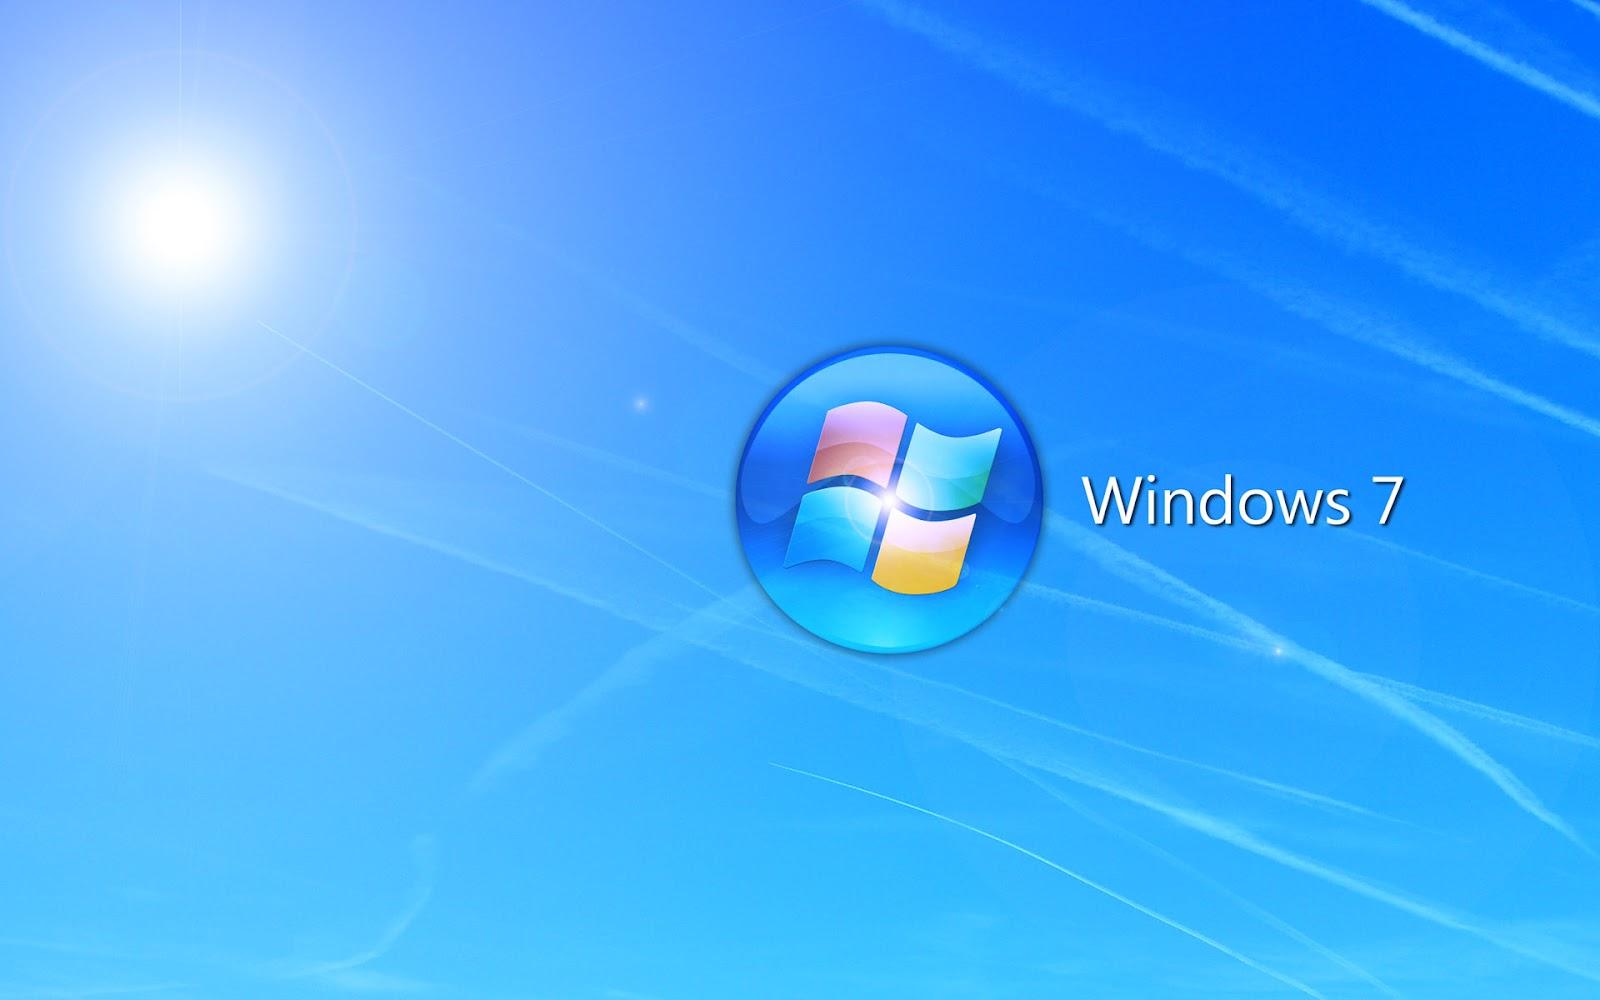 Windows 7 HD Beautiful Wallpapers - HD Wallpapers | Rooteto